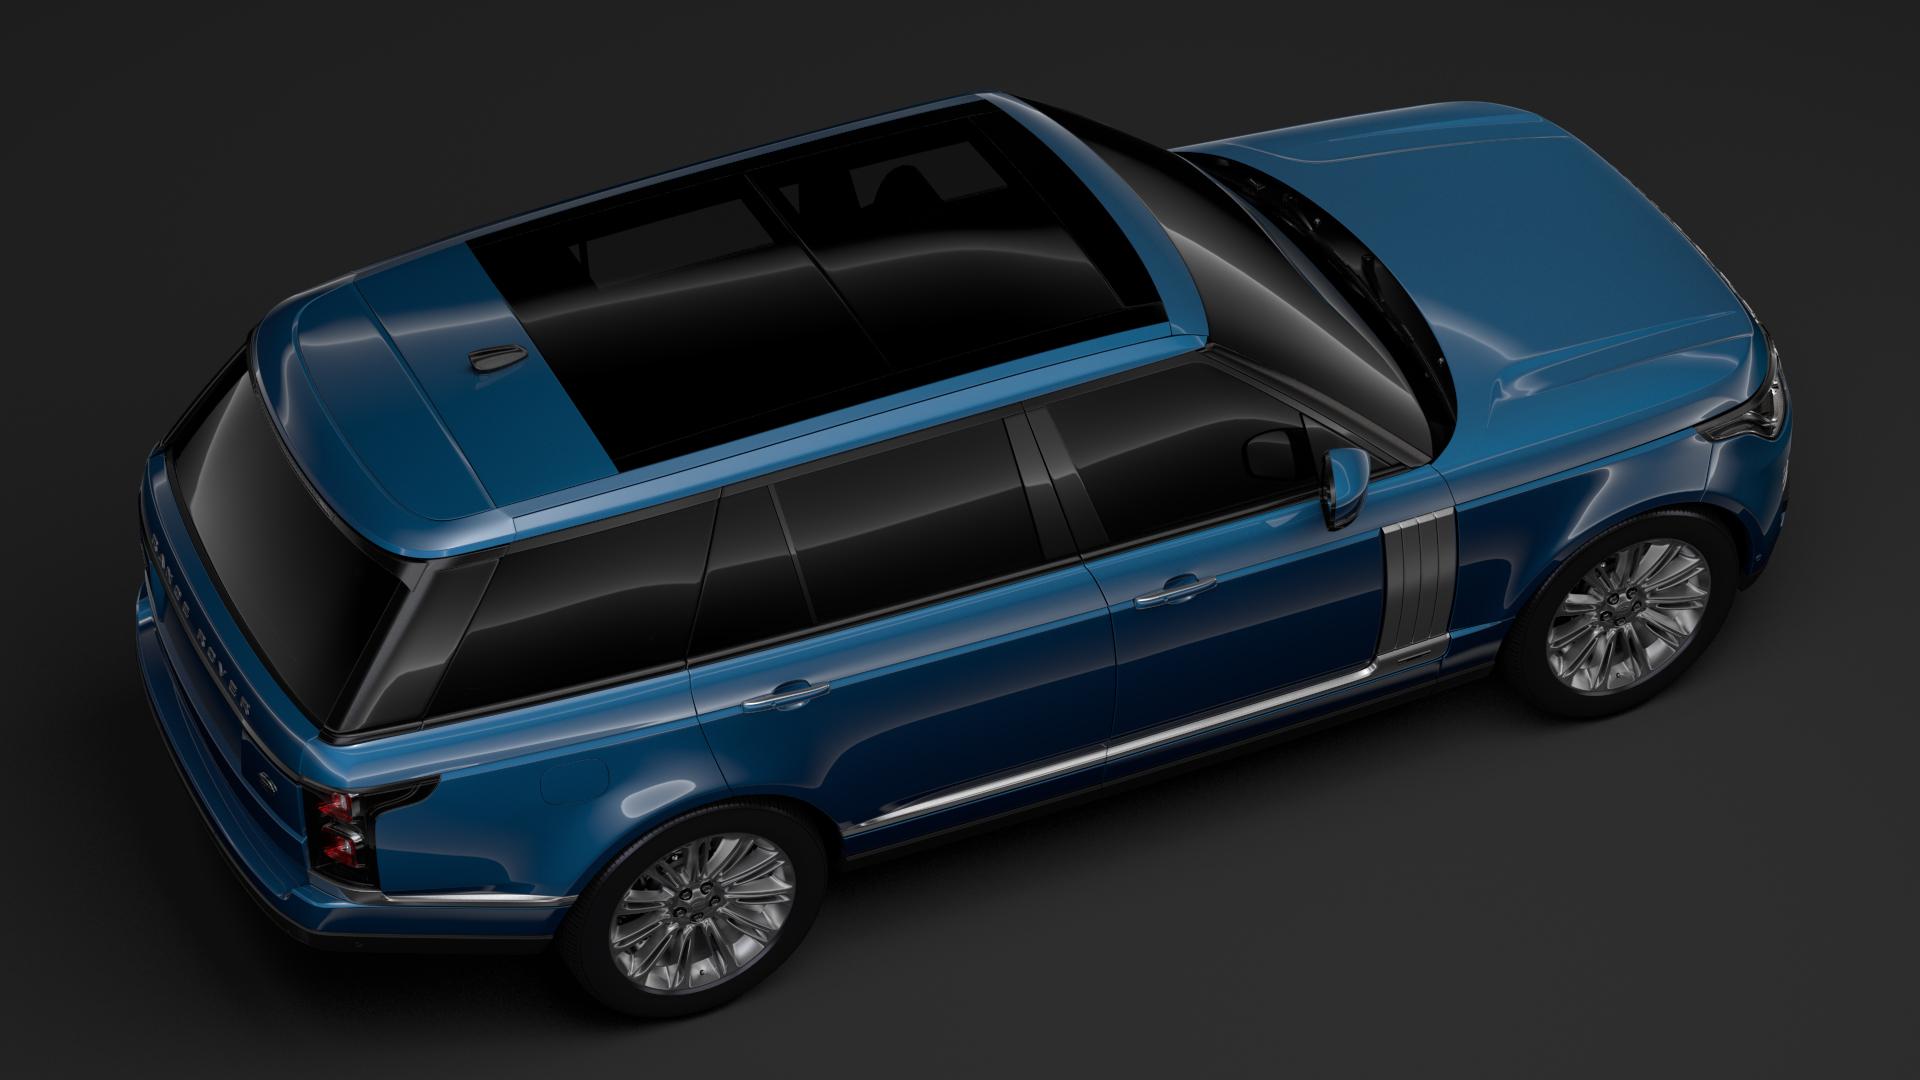 range rover autobiography lwb l405 2018 3d model max fbx c4d lwo ma mb hrc xsi obj 277334